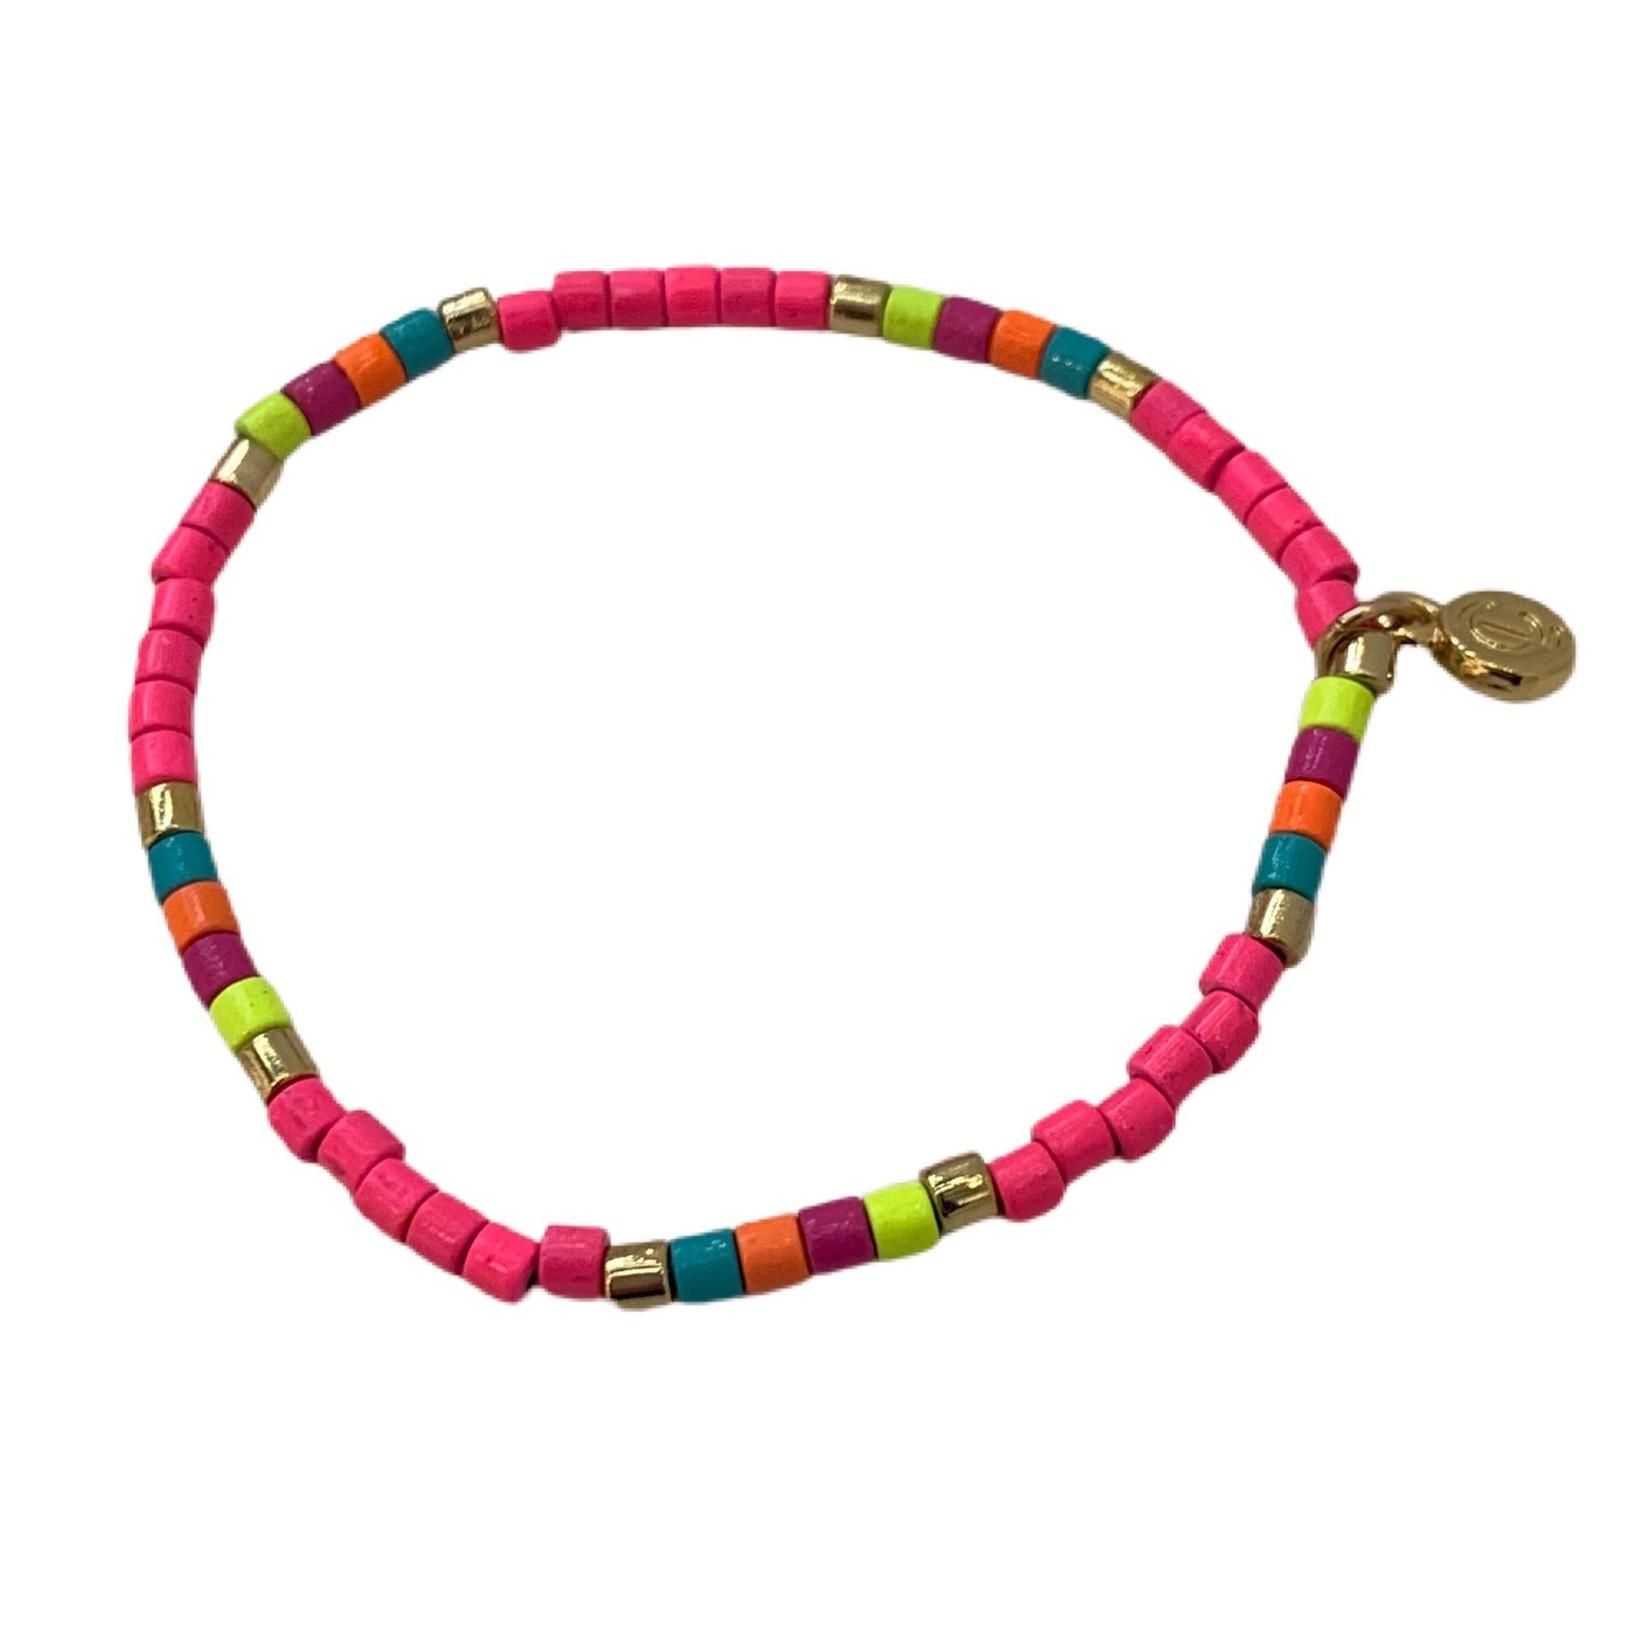 Caryn Lawn Tube Tile Bracelet Neon Pink